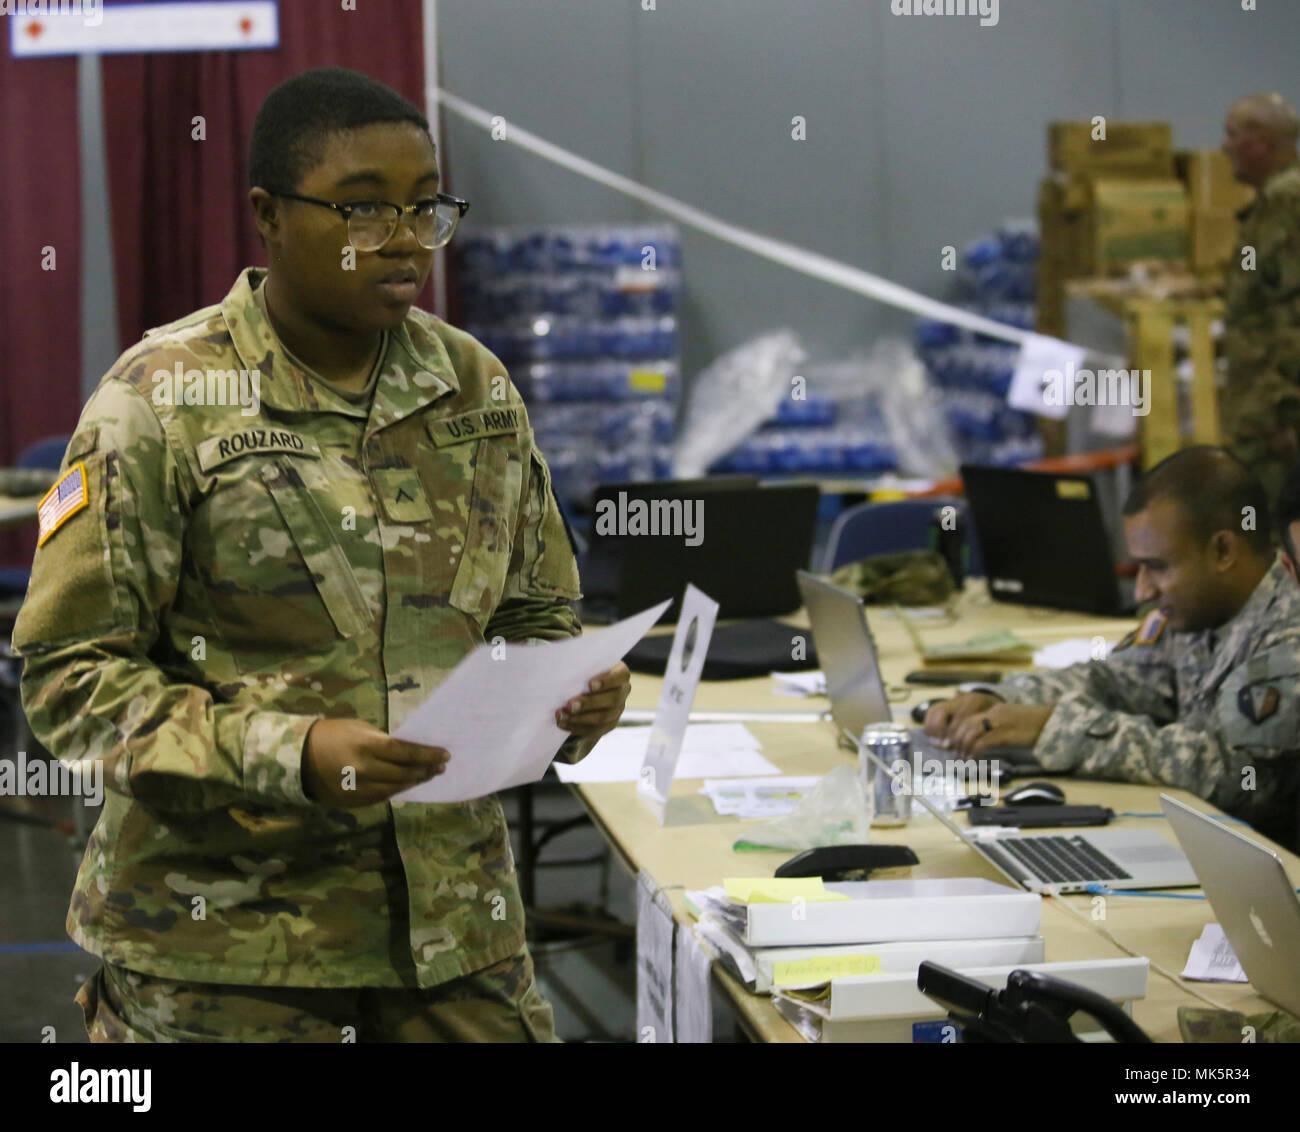 Pursuing Army Stock Photos & Pursuing Army Stock Images - Alamy